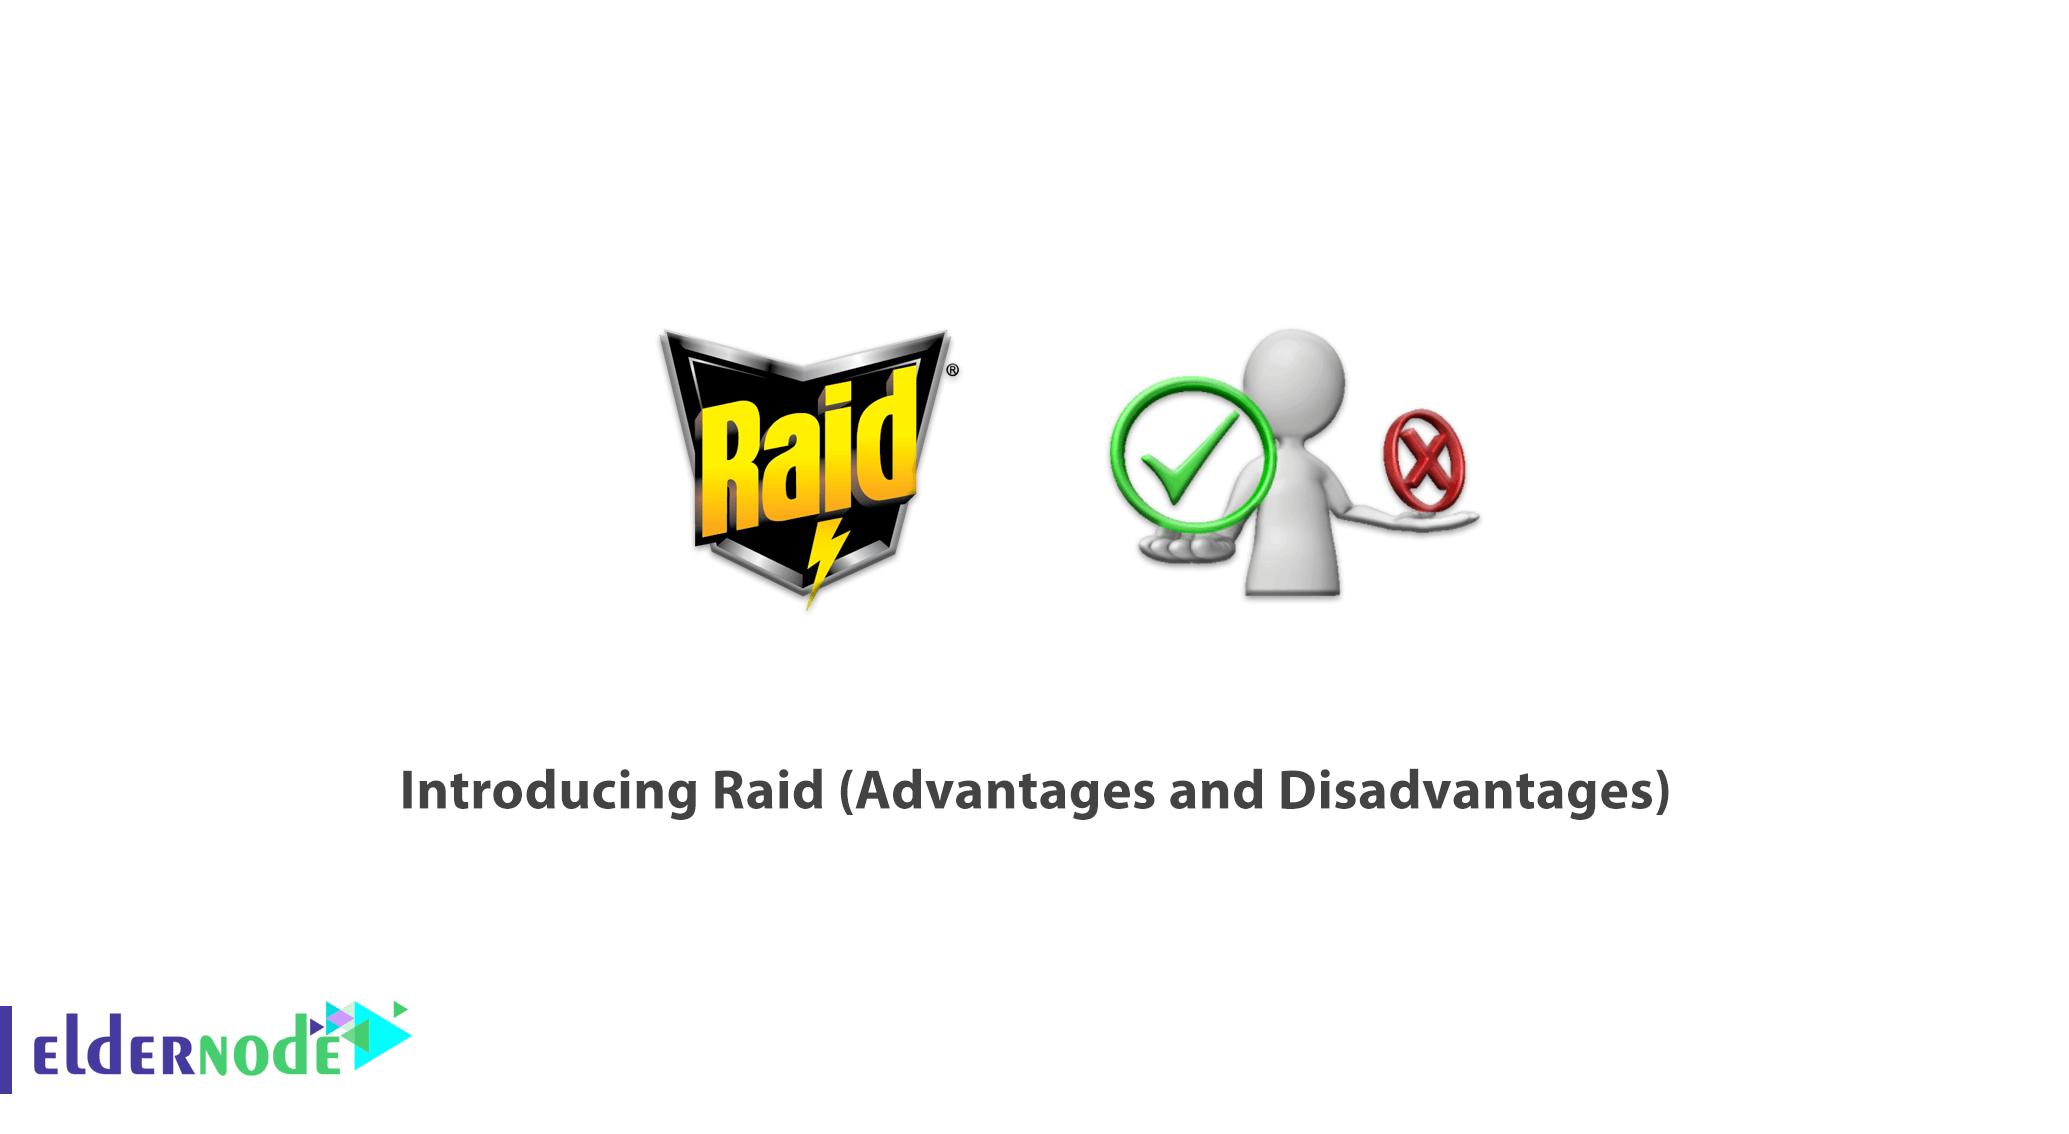 Introducing Raid (Advantages and Disadvantages)